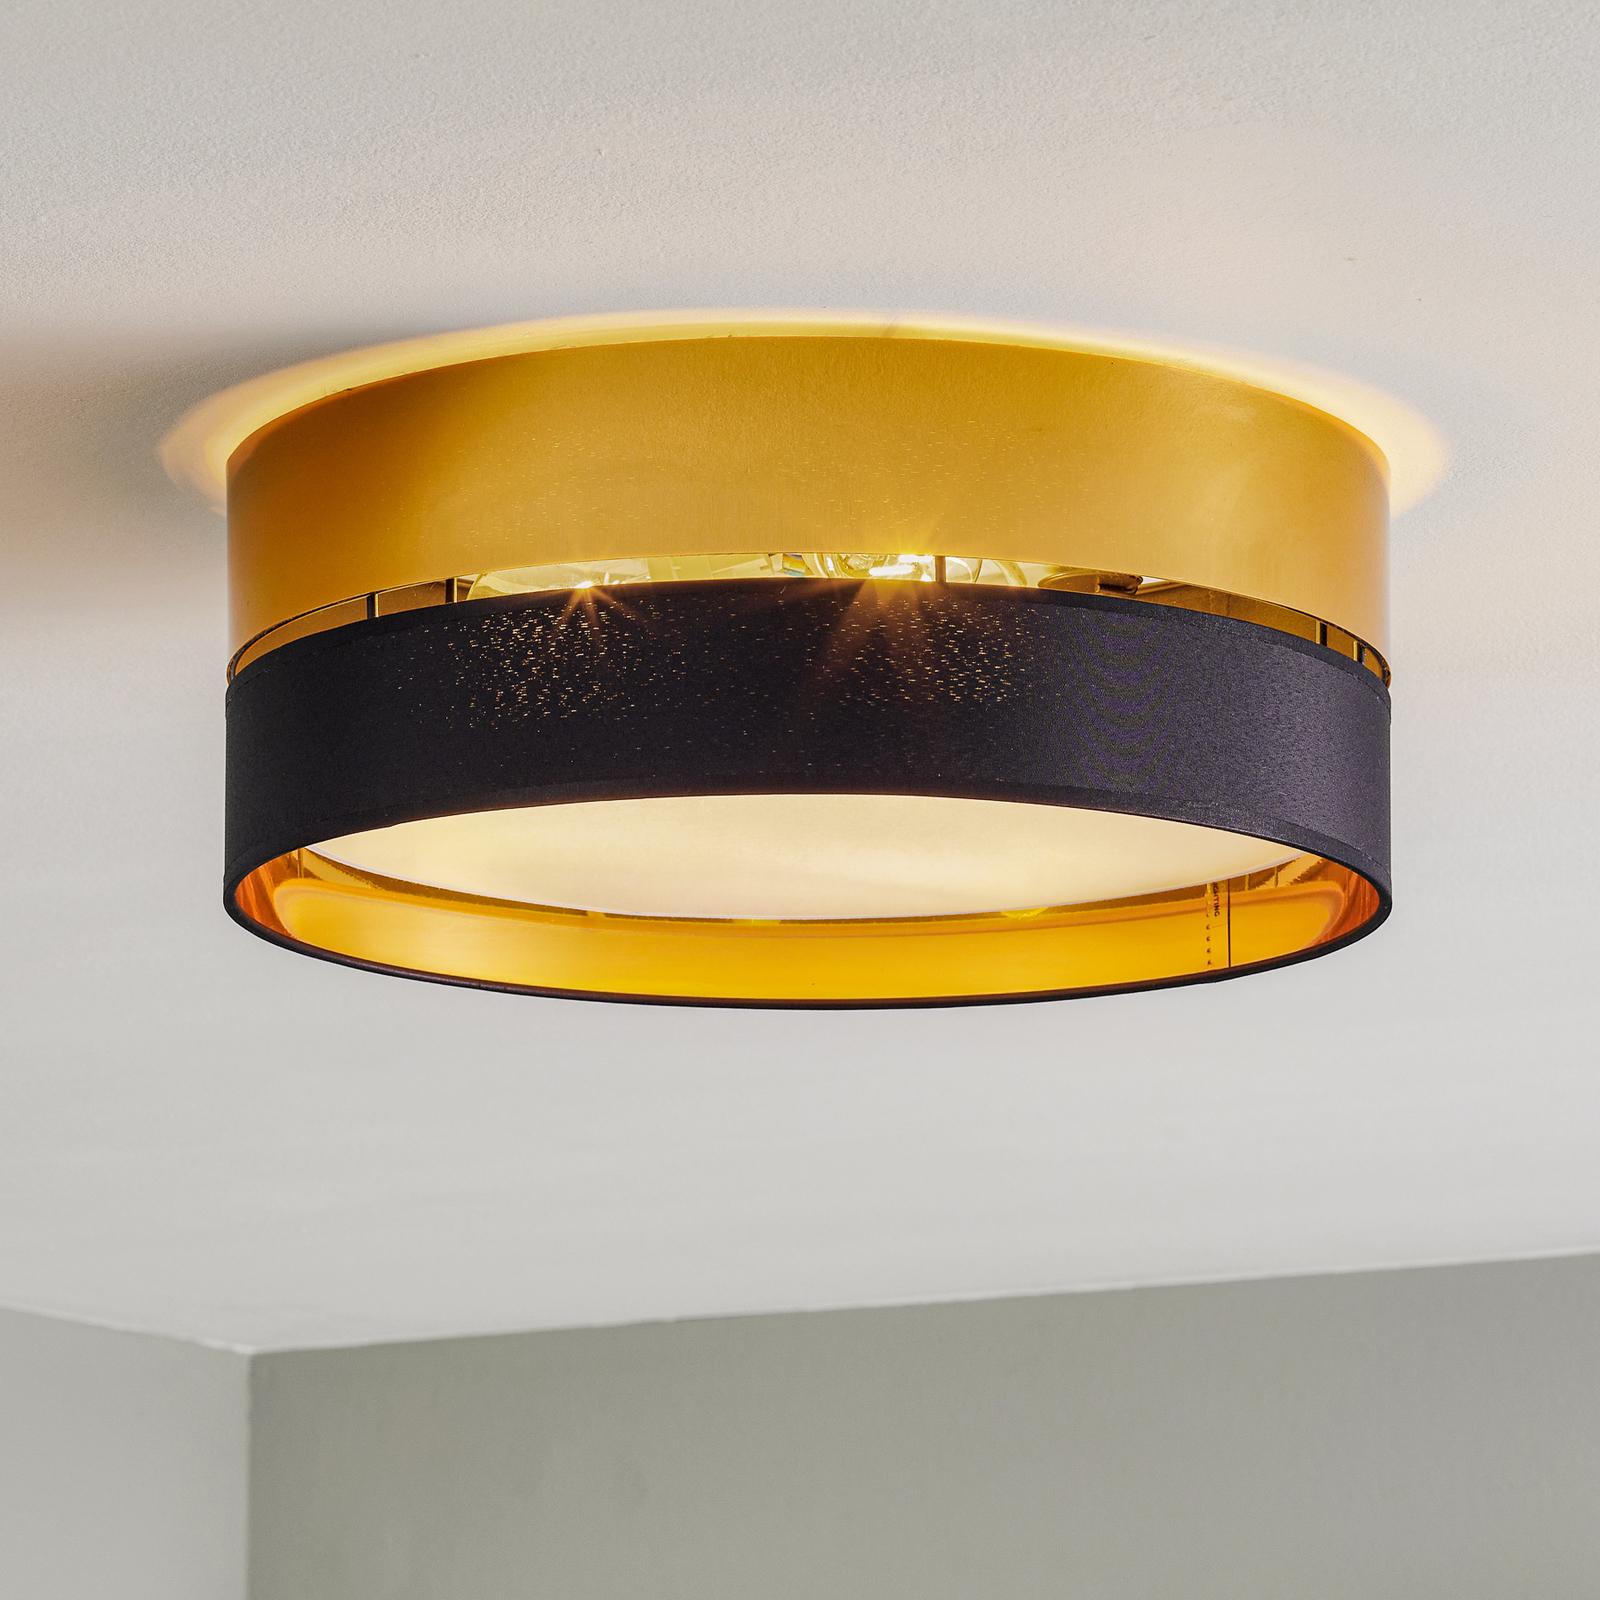 Hilton taklampe, svart/gull, Ø 45 cm